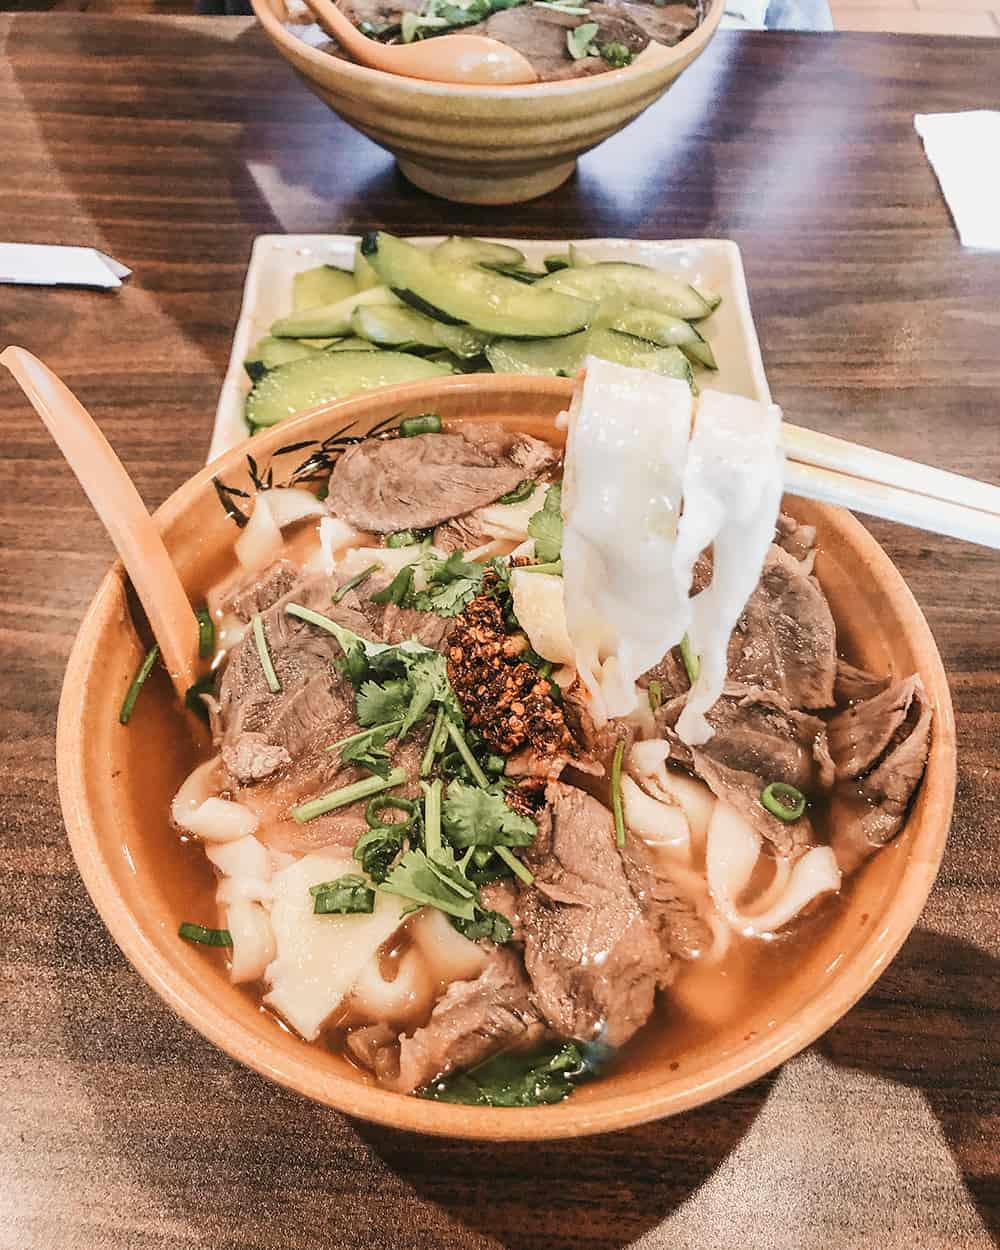 Julie's Noodles in Austin, TX